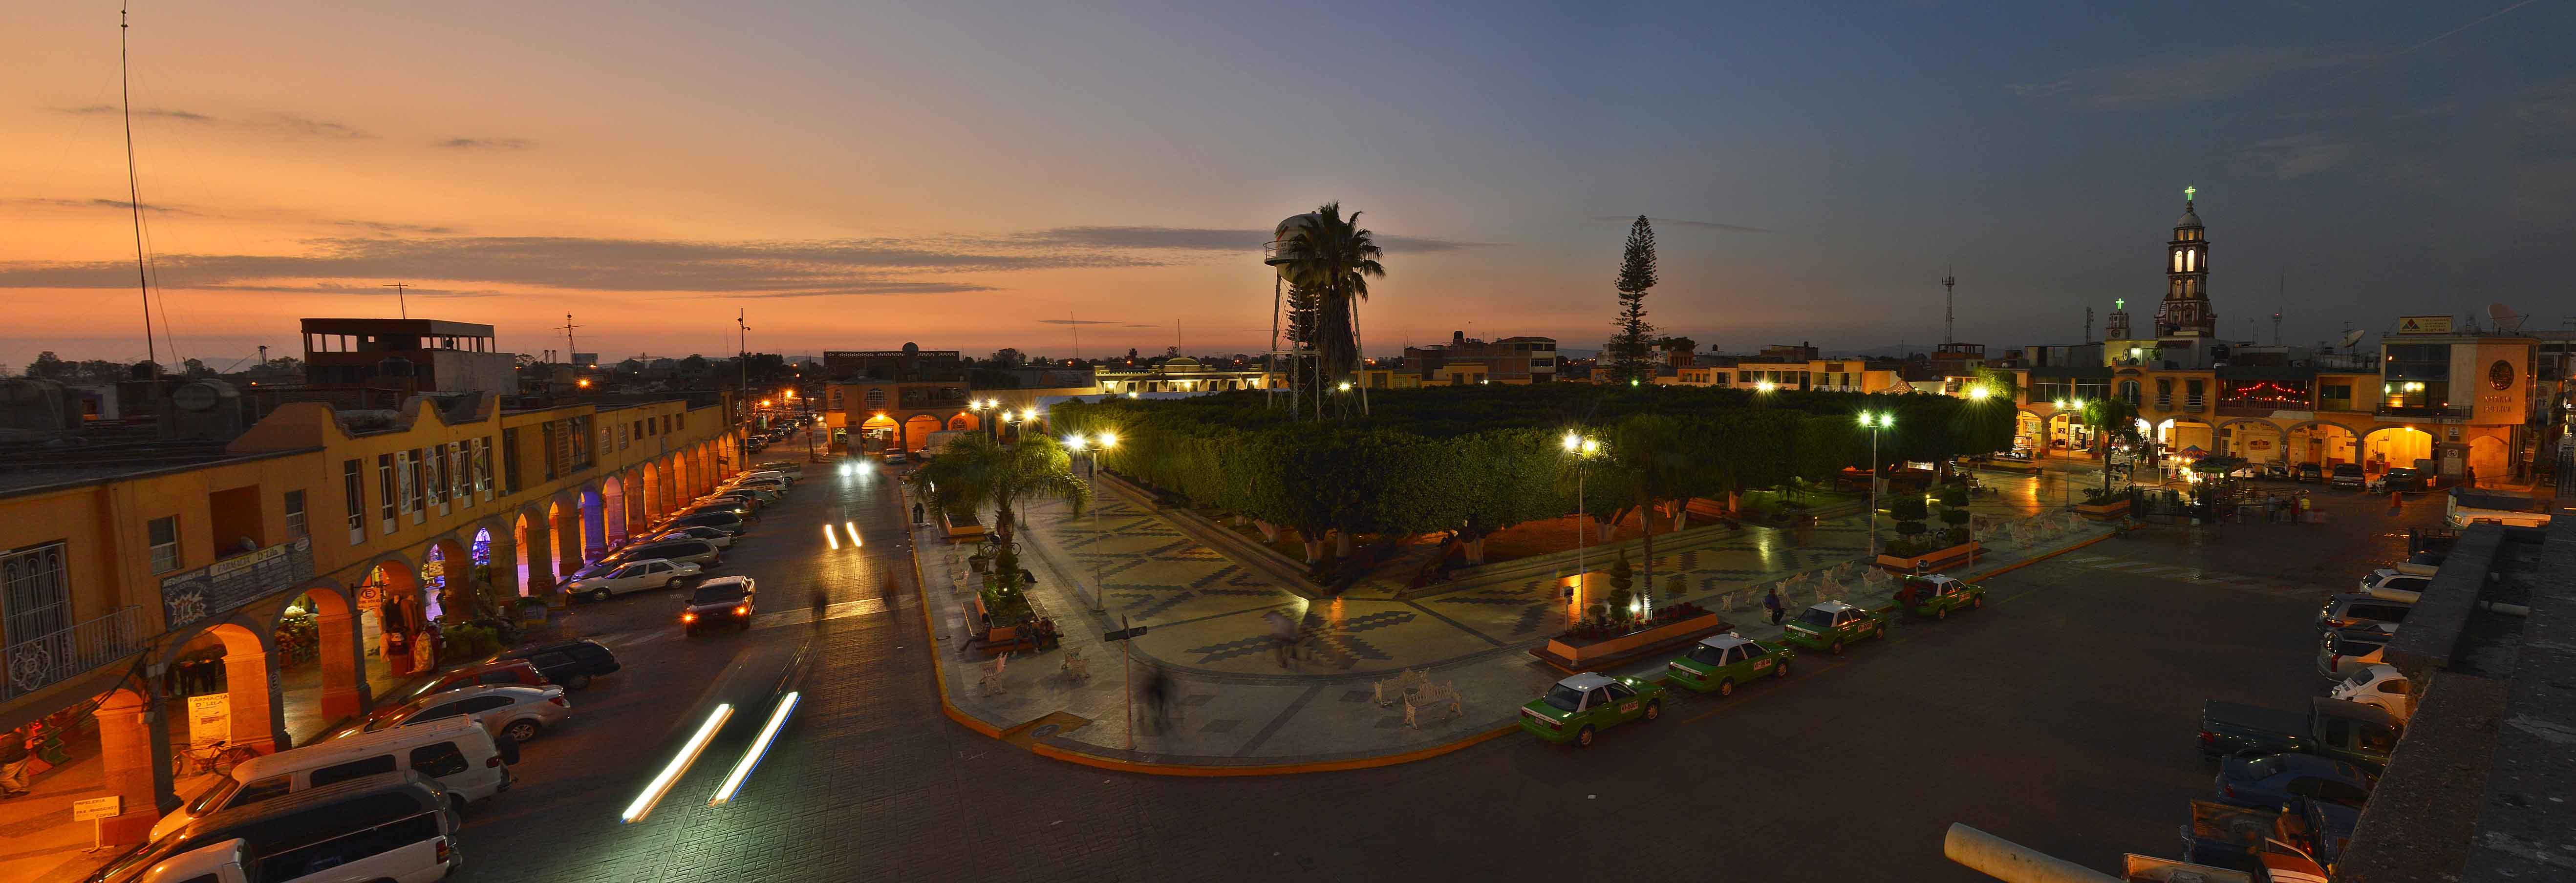 Villagrán